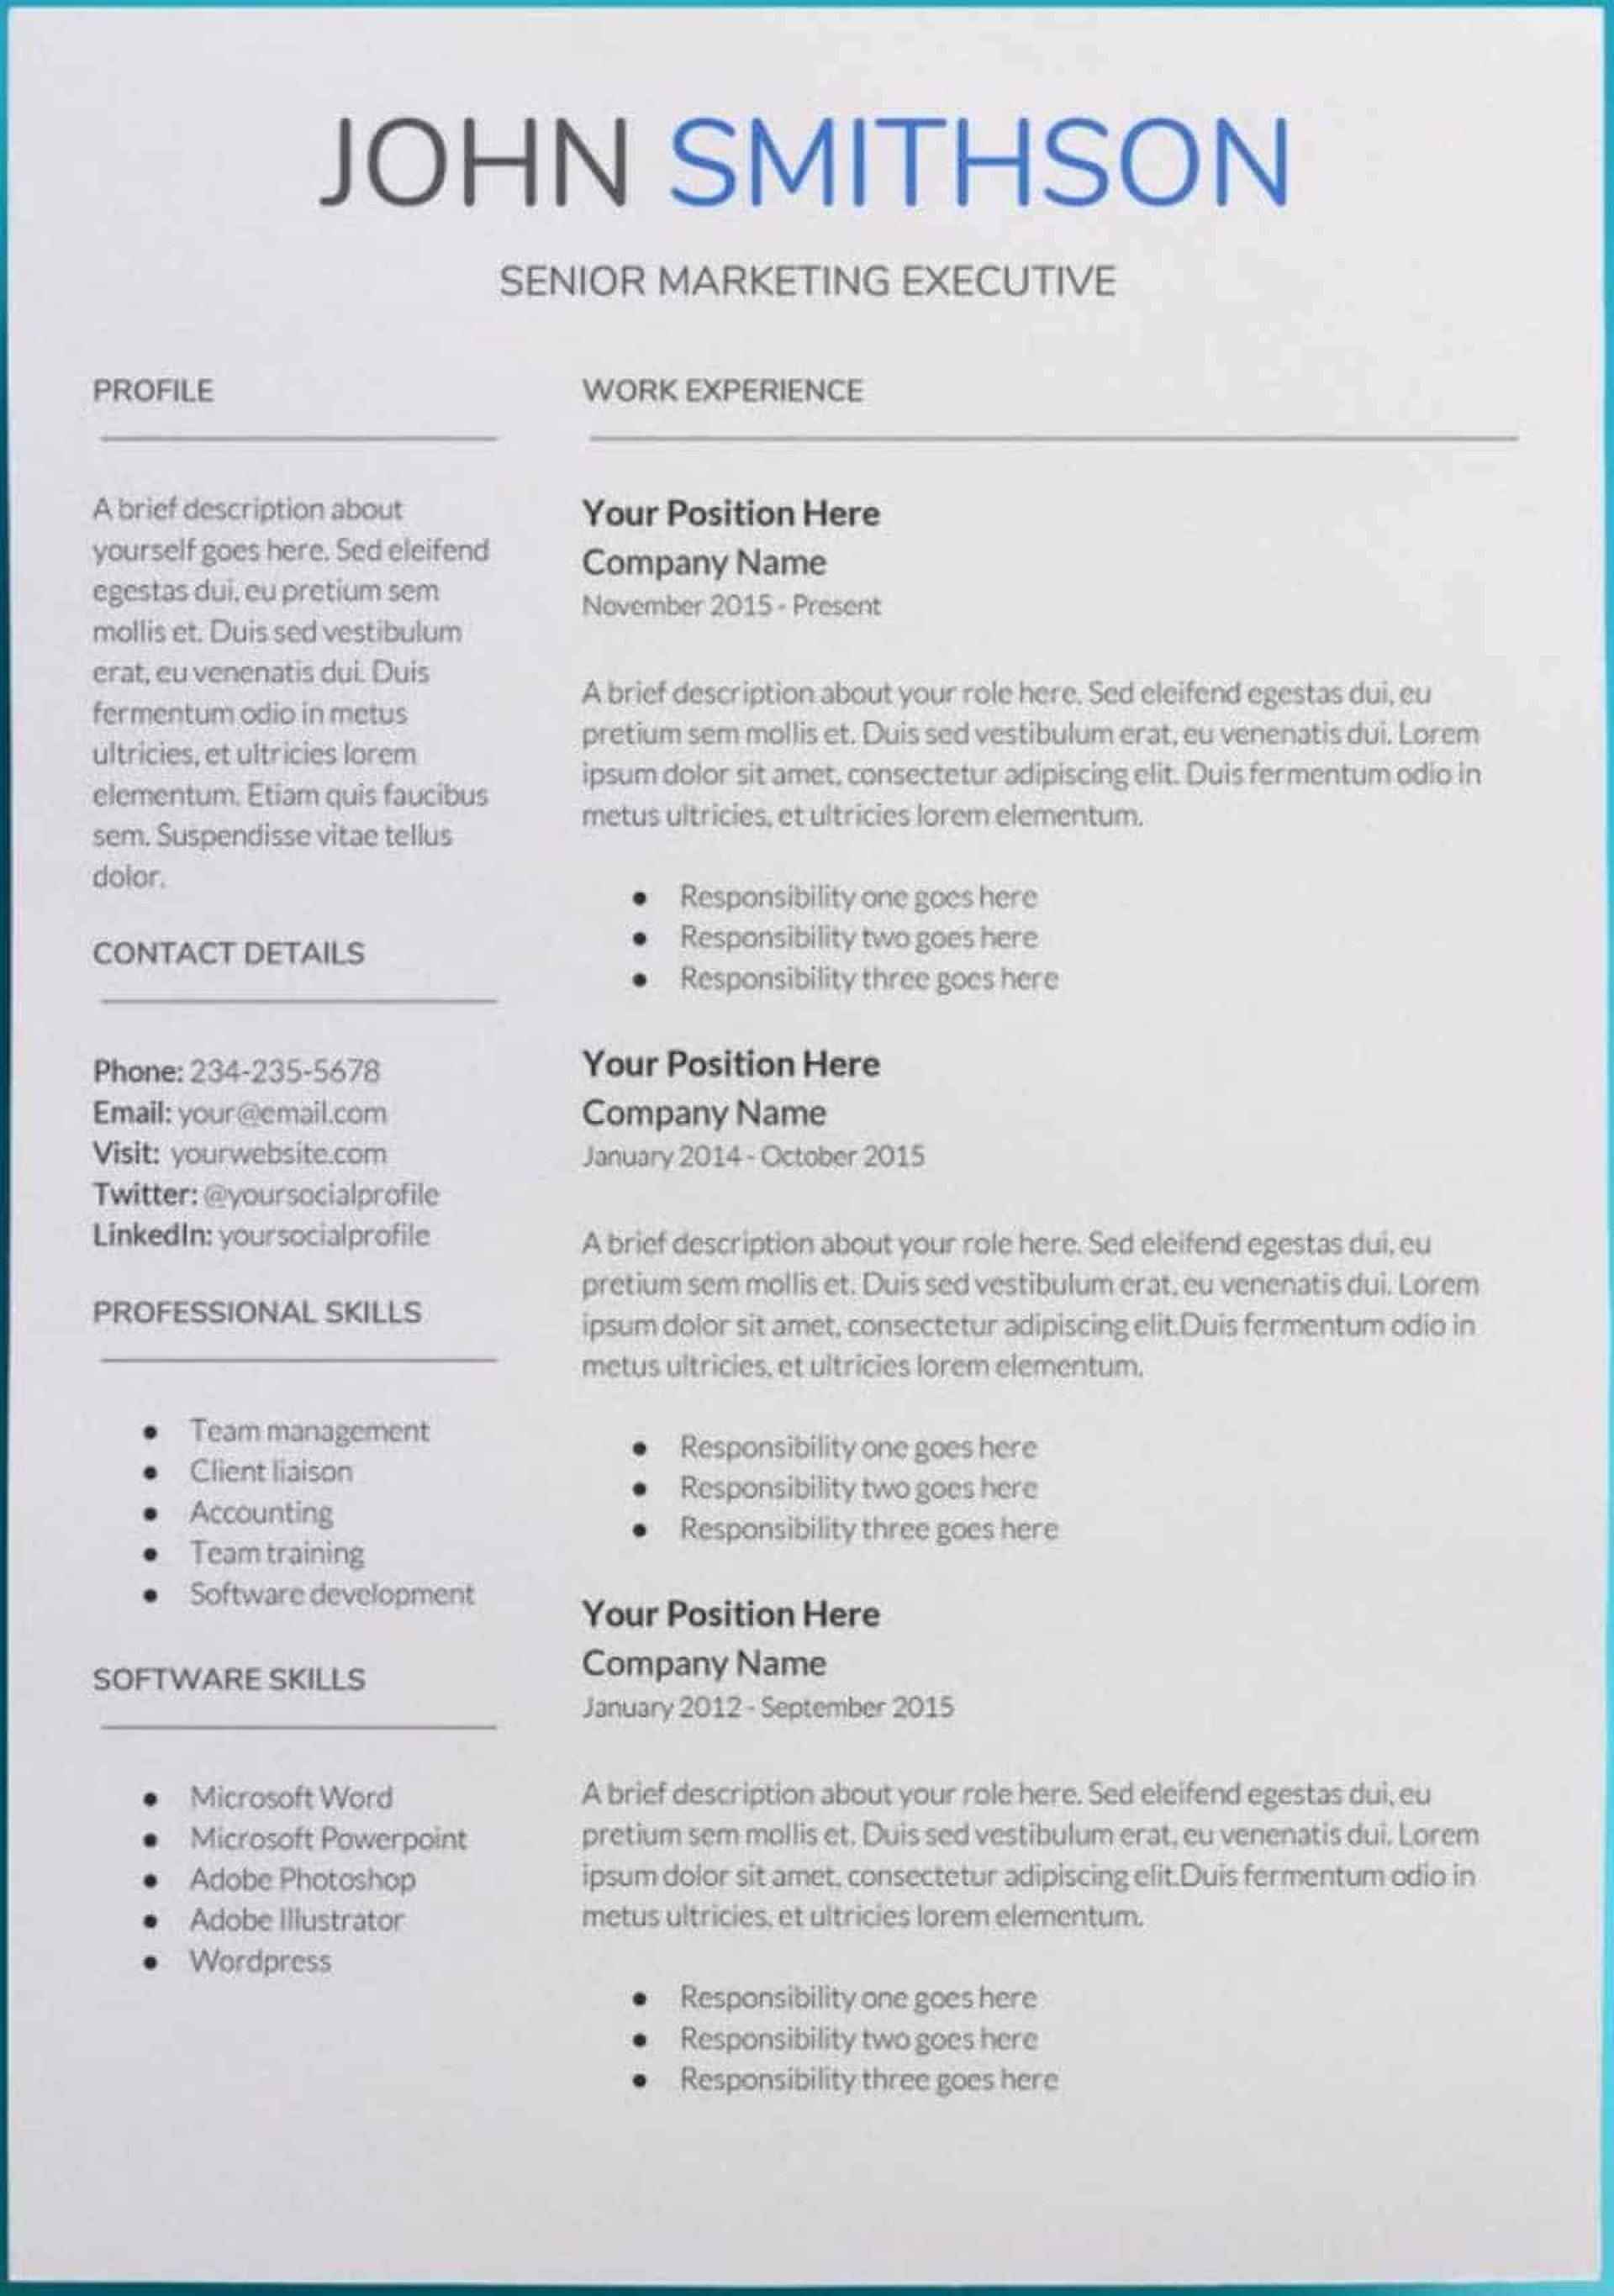 007 Sensational Professional Cv Template Free Online Photo  Resume1920